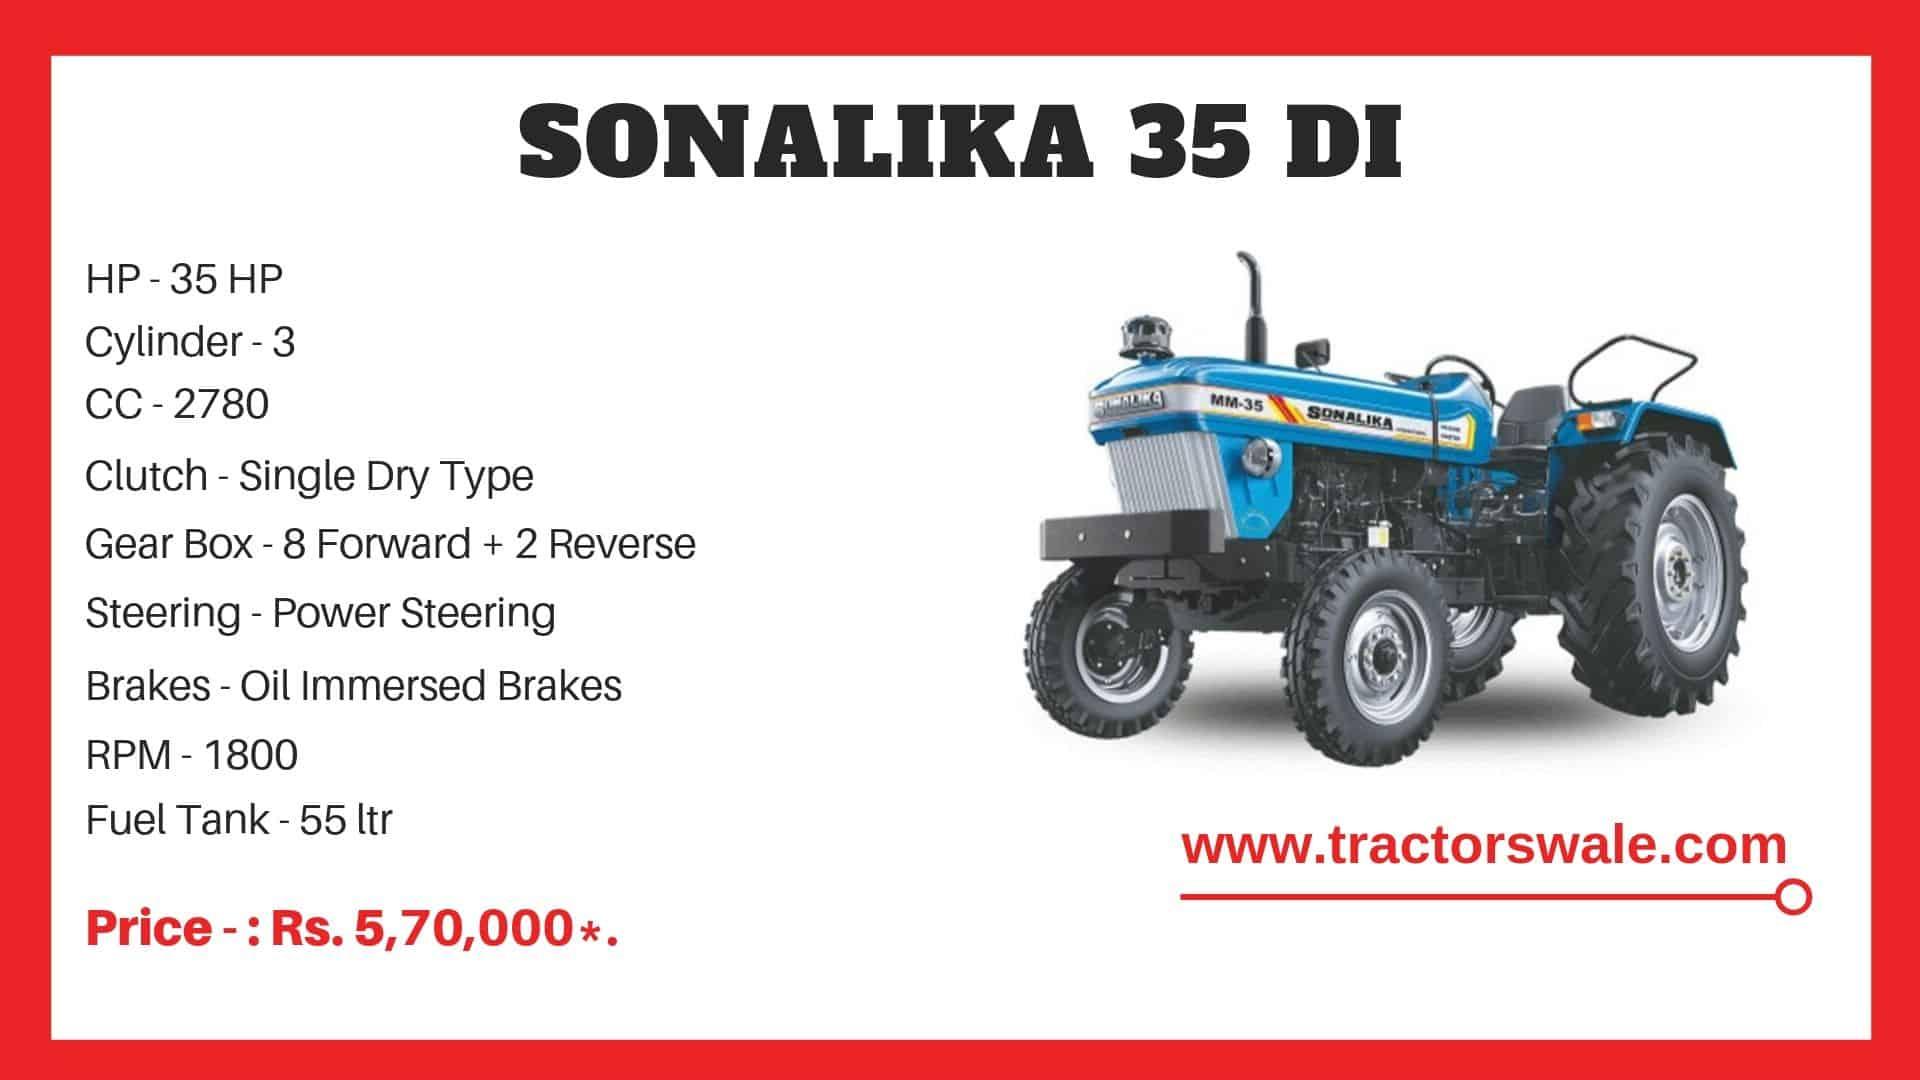 Sonalika 35 DI tractor specs